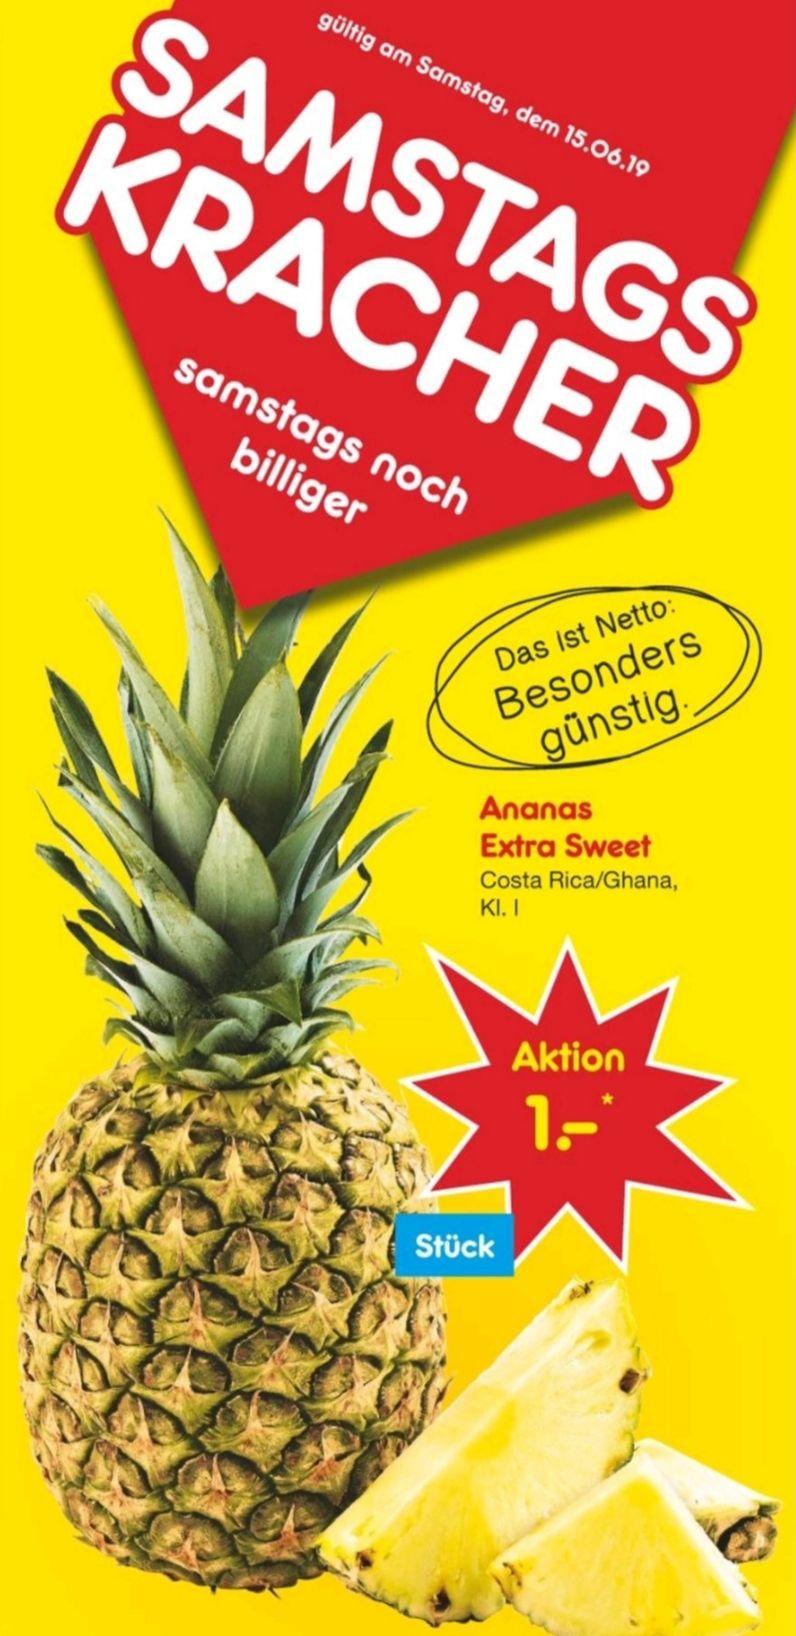 [Netto MD] Ananas Extra Sweet für 1,- am 15.06.2019